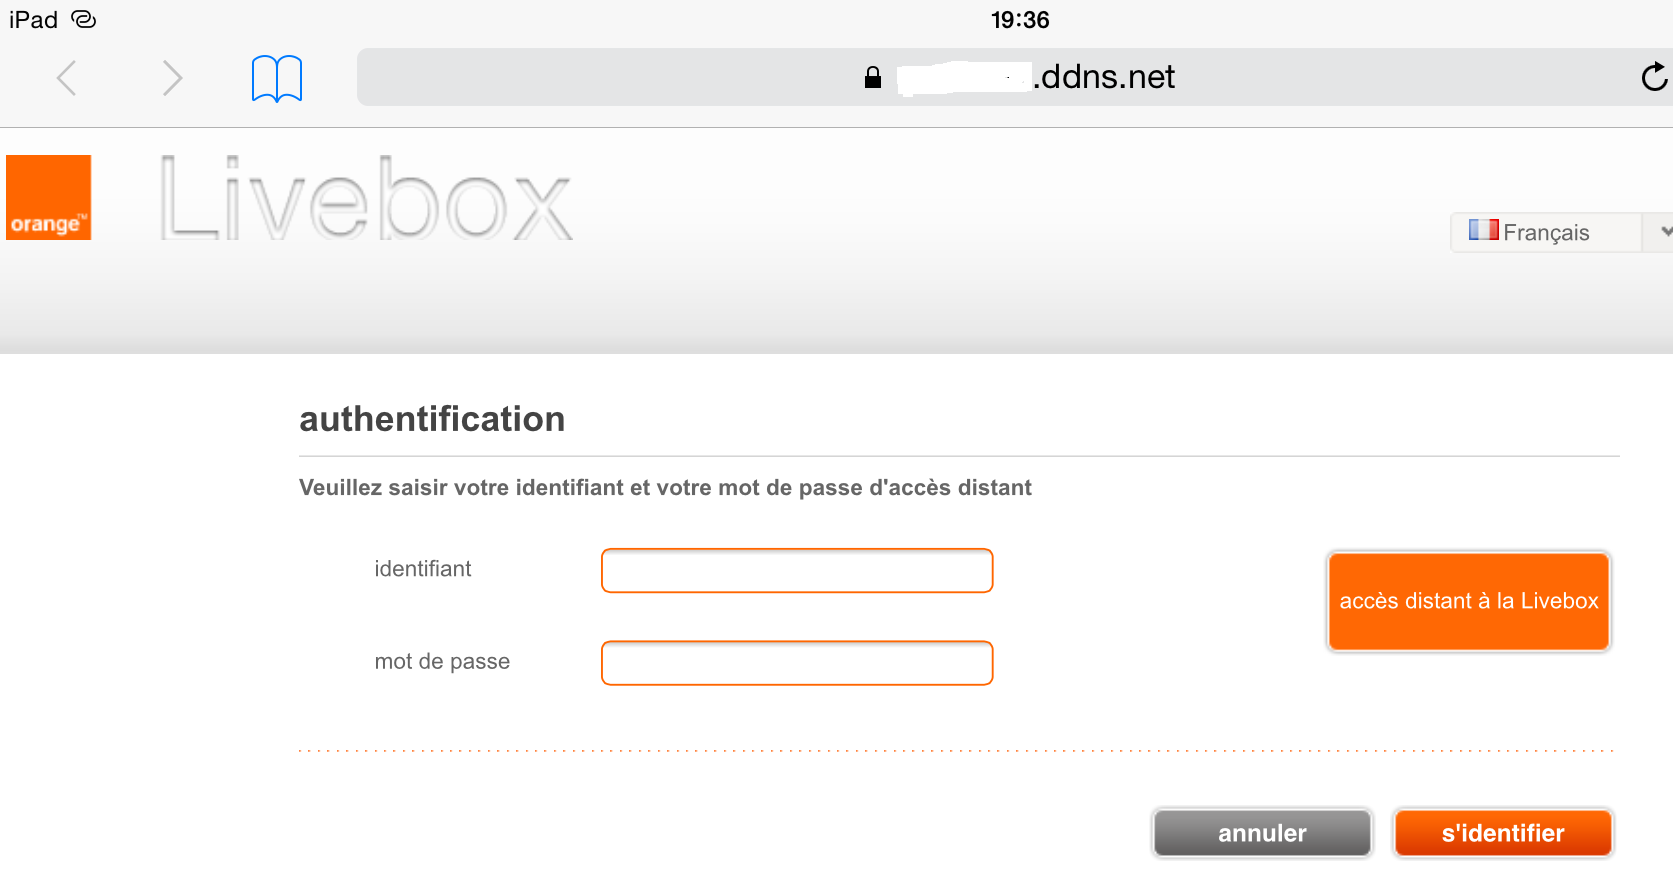 accrs_externe_livebox.PNG